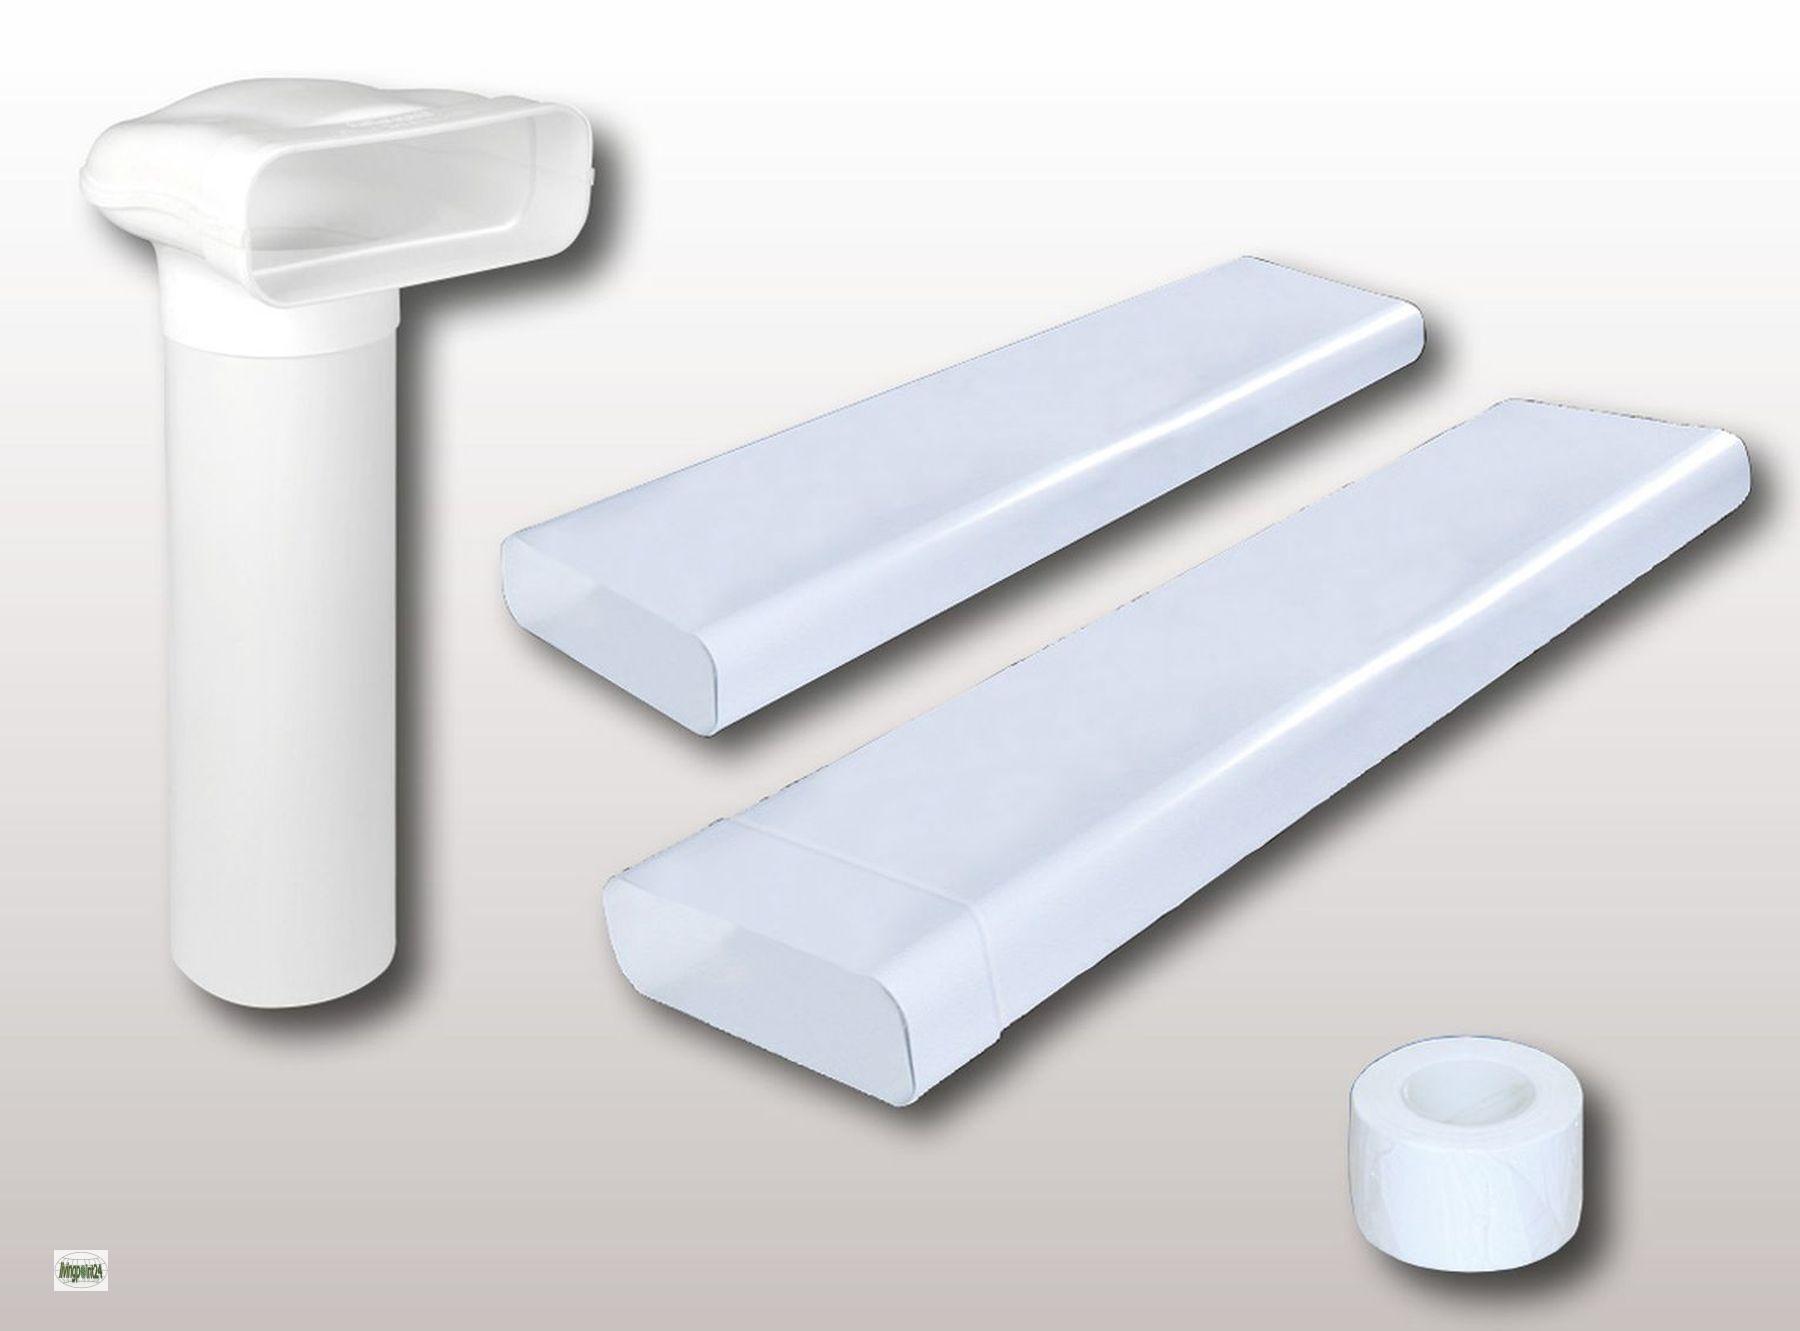 power 150 conducto plano set 230x80mm aire de salida cocina parte 4 tuber a ebay. Black Bedroom Furniture Sets. Home Design Ideas